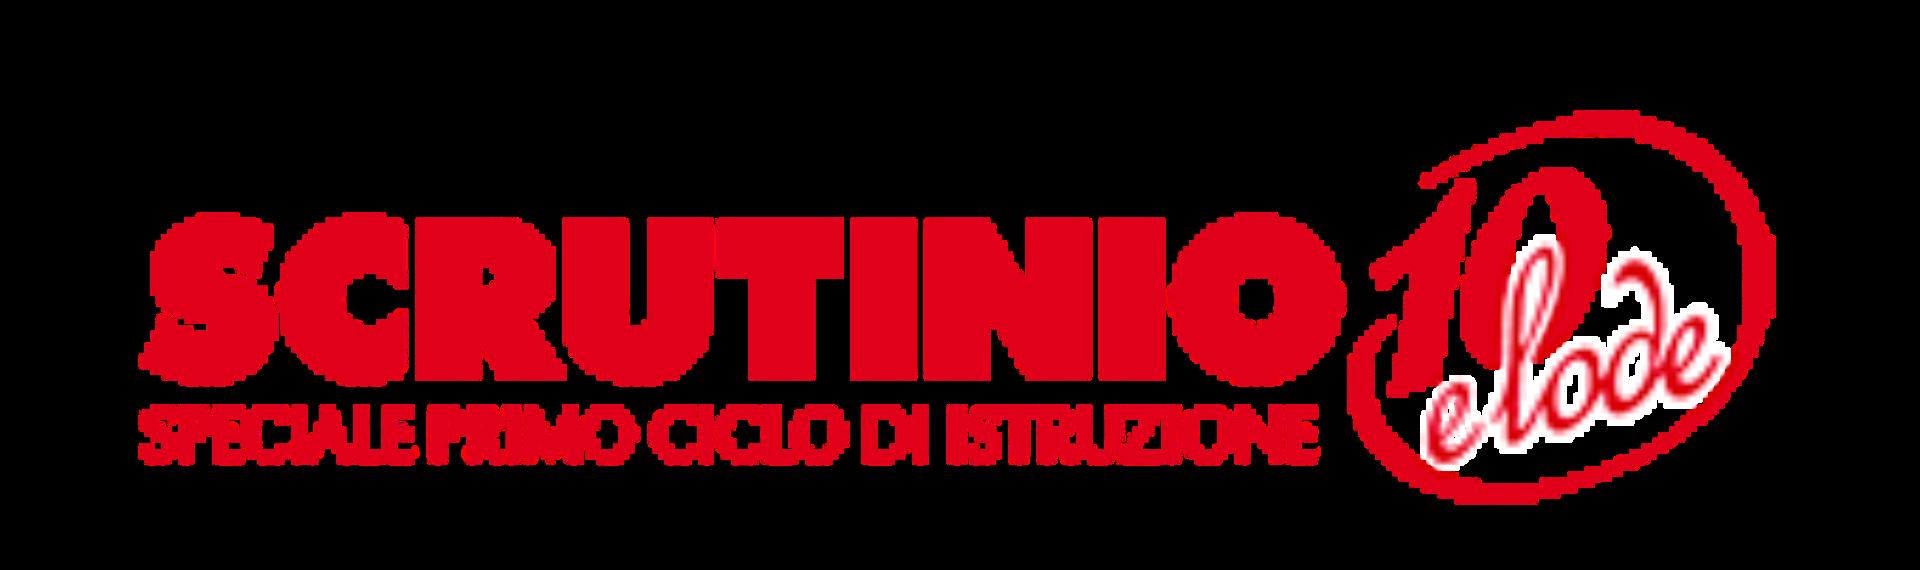 Scrutini online